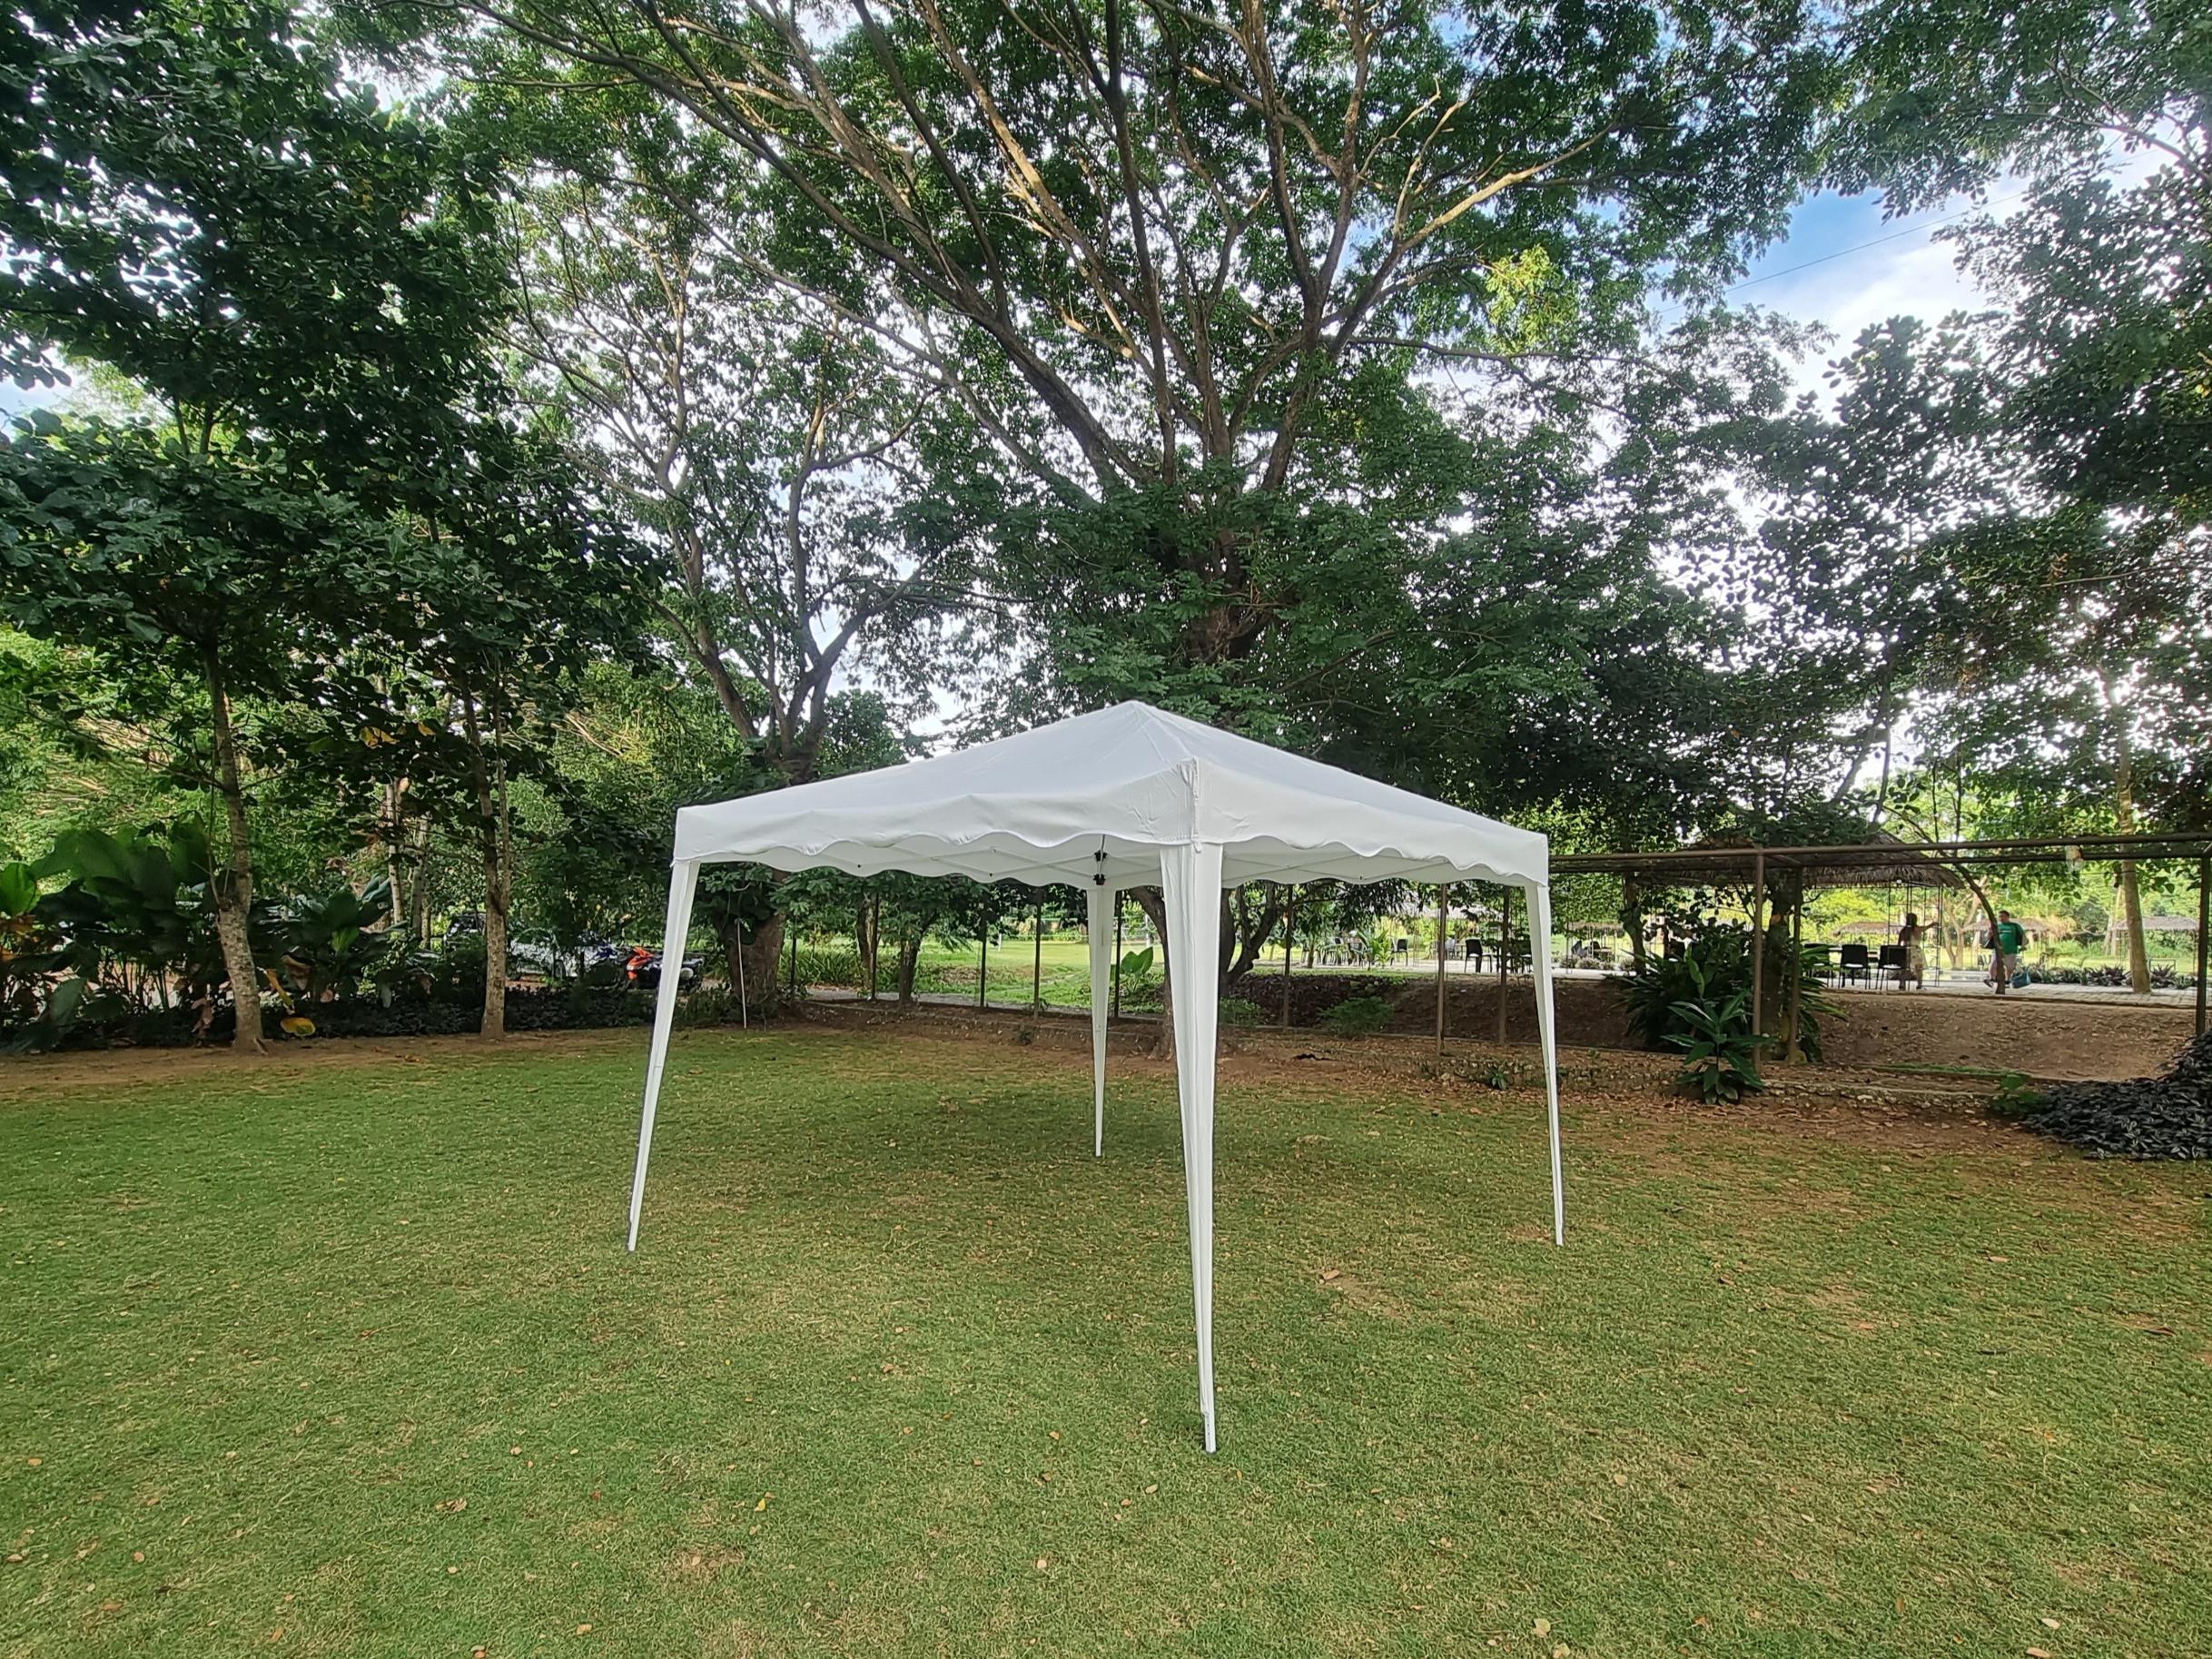 Shade Tents - Open Field